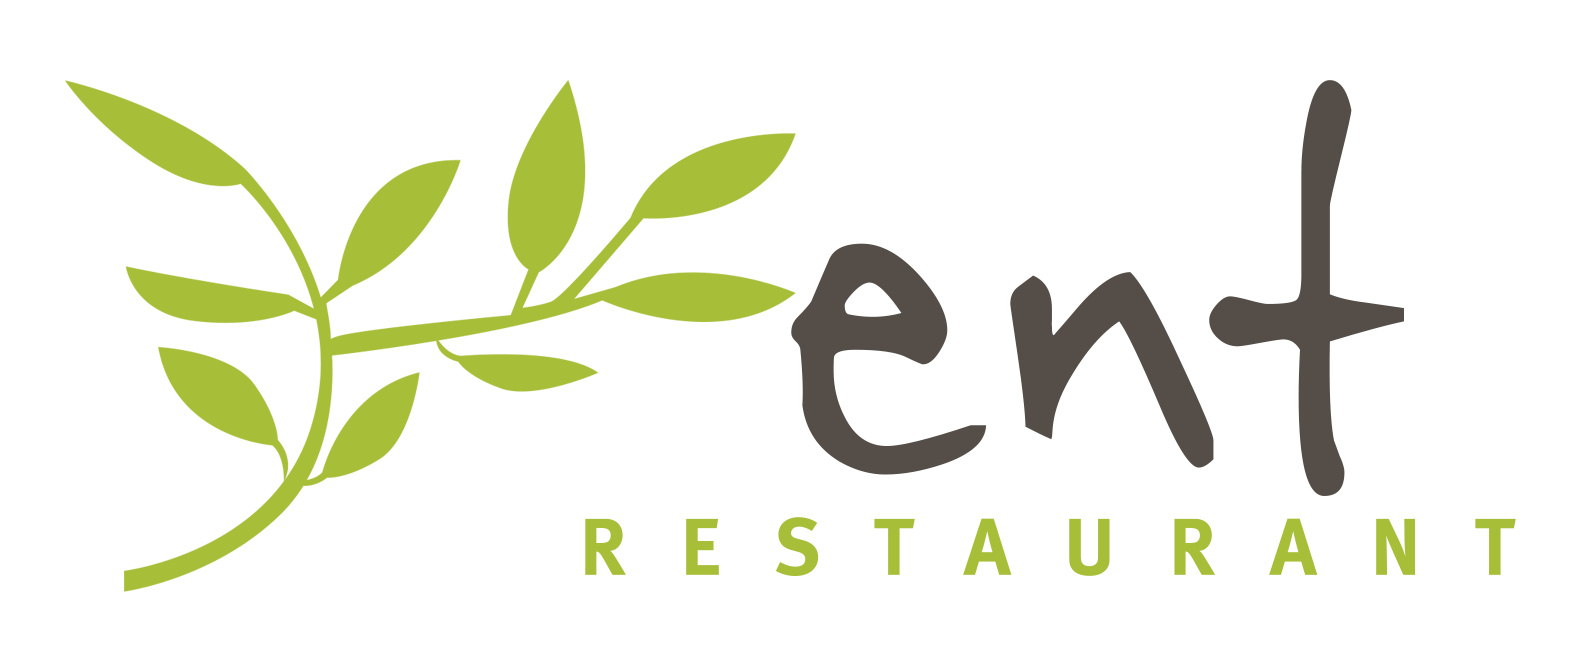 Ent Restaurant